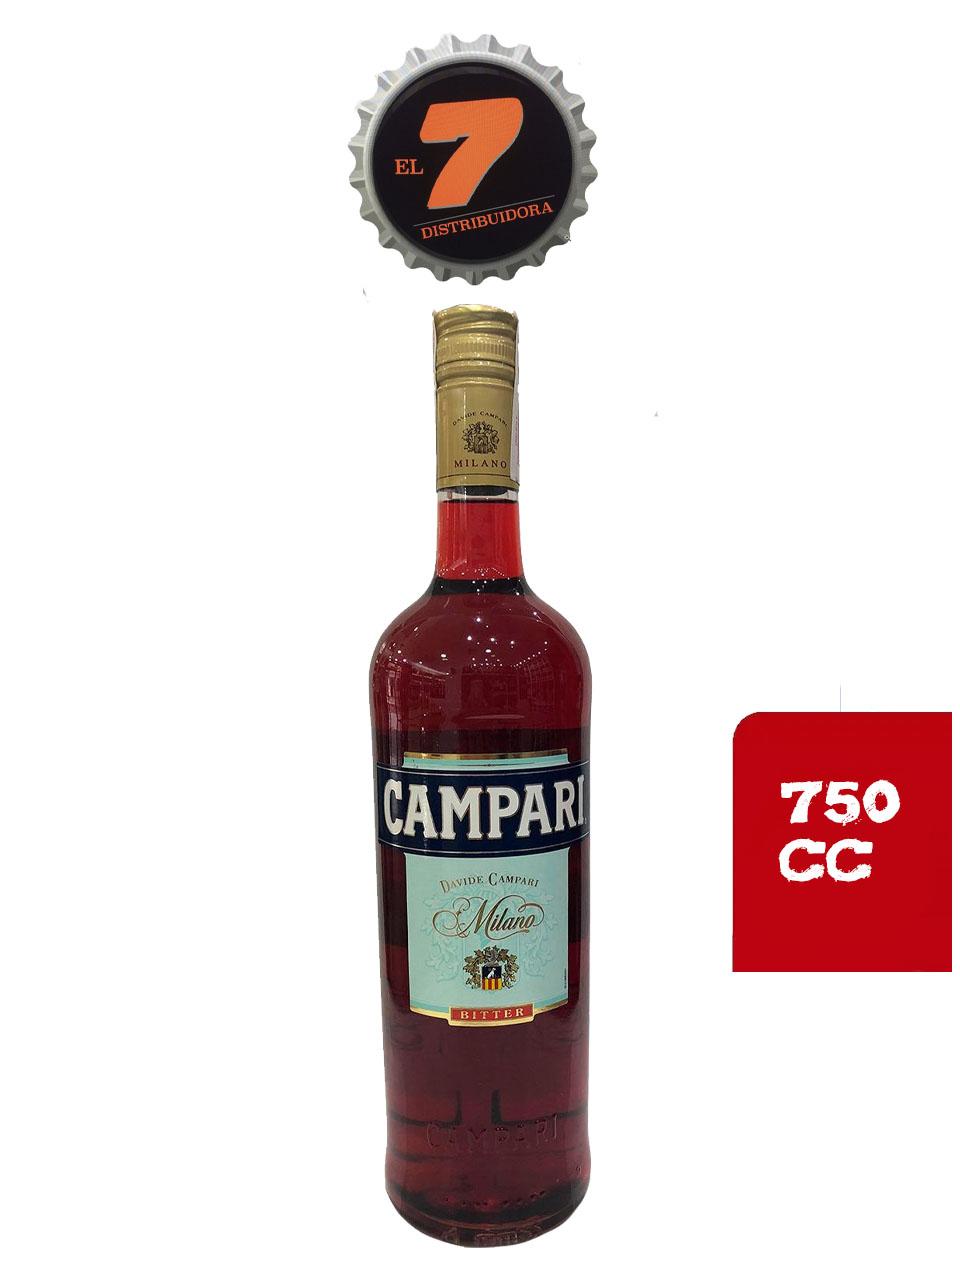 Campari 750 CC